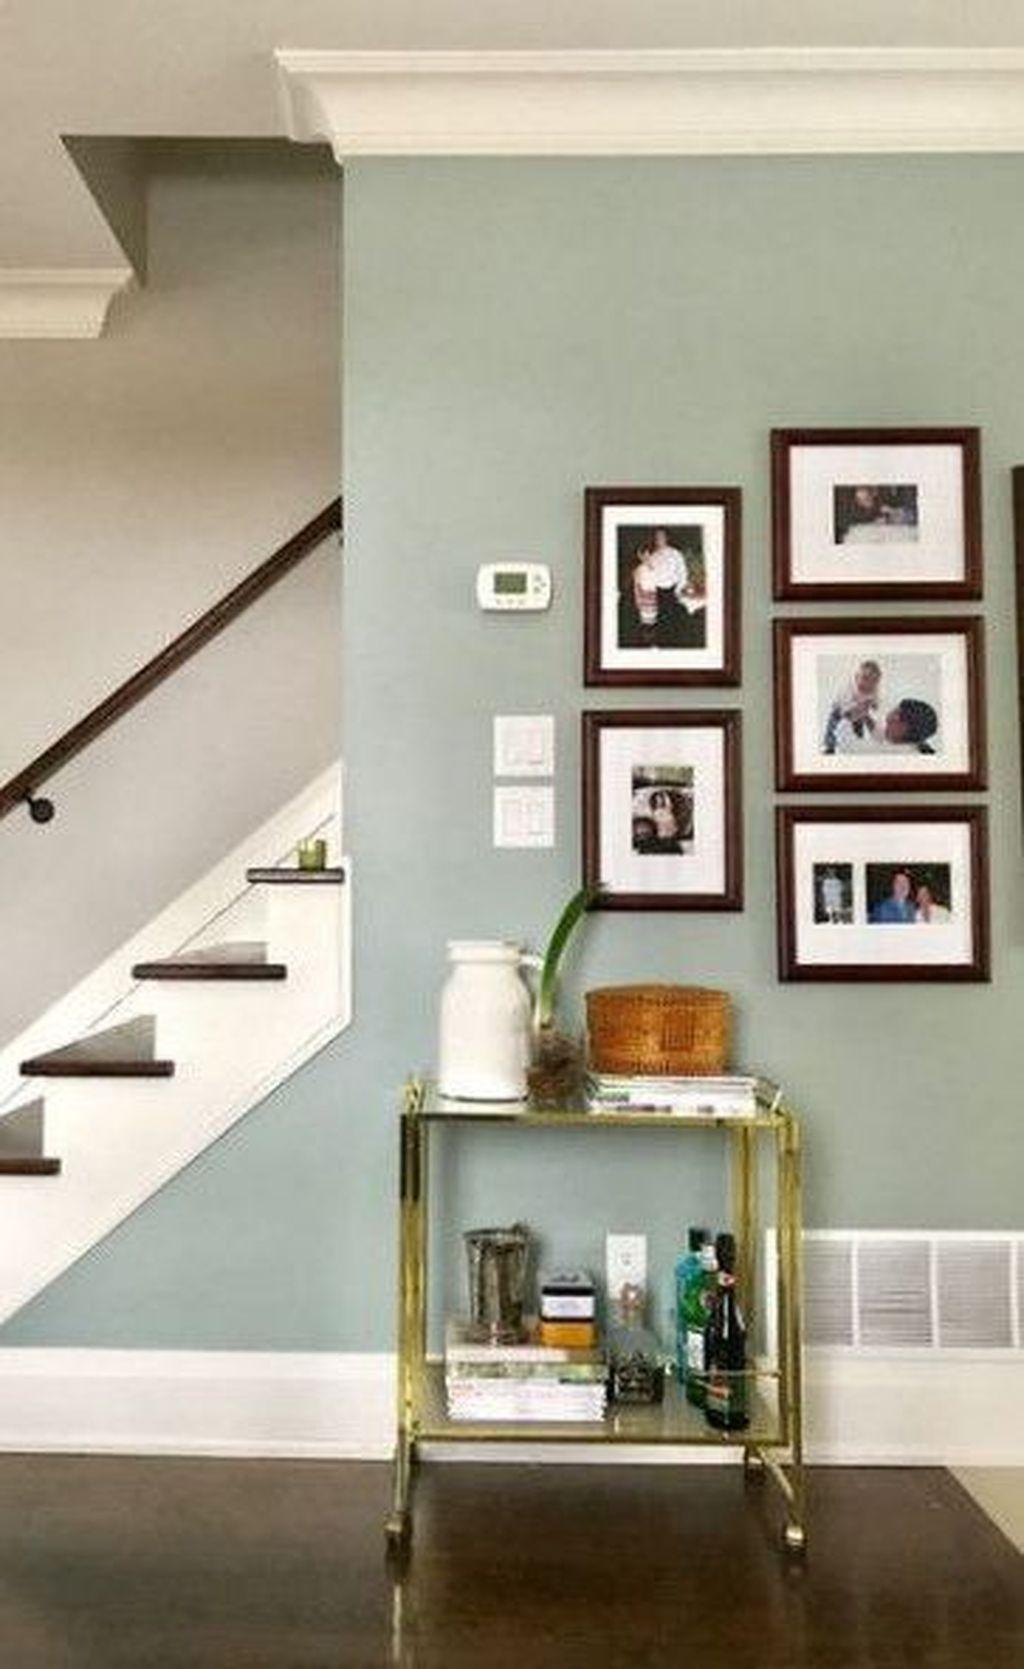 Operazioni preliminari per dipingere casa: 35 Best Home Wall Paint Color Ideas That Suitable For Your Living Room Room Wall Colors Living Room Wall Color Paint Colors For Living Room